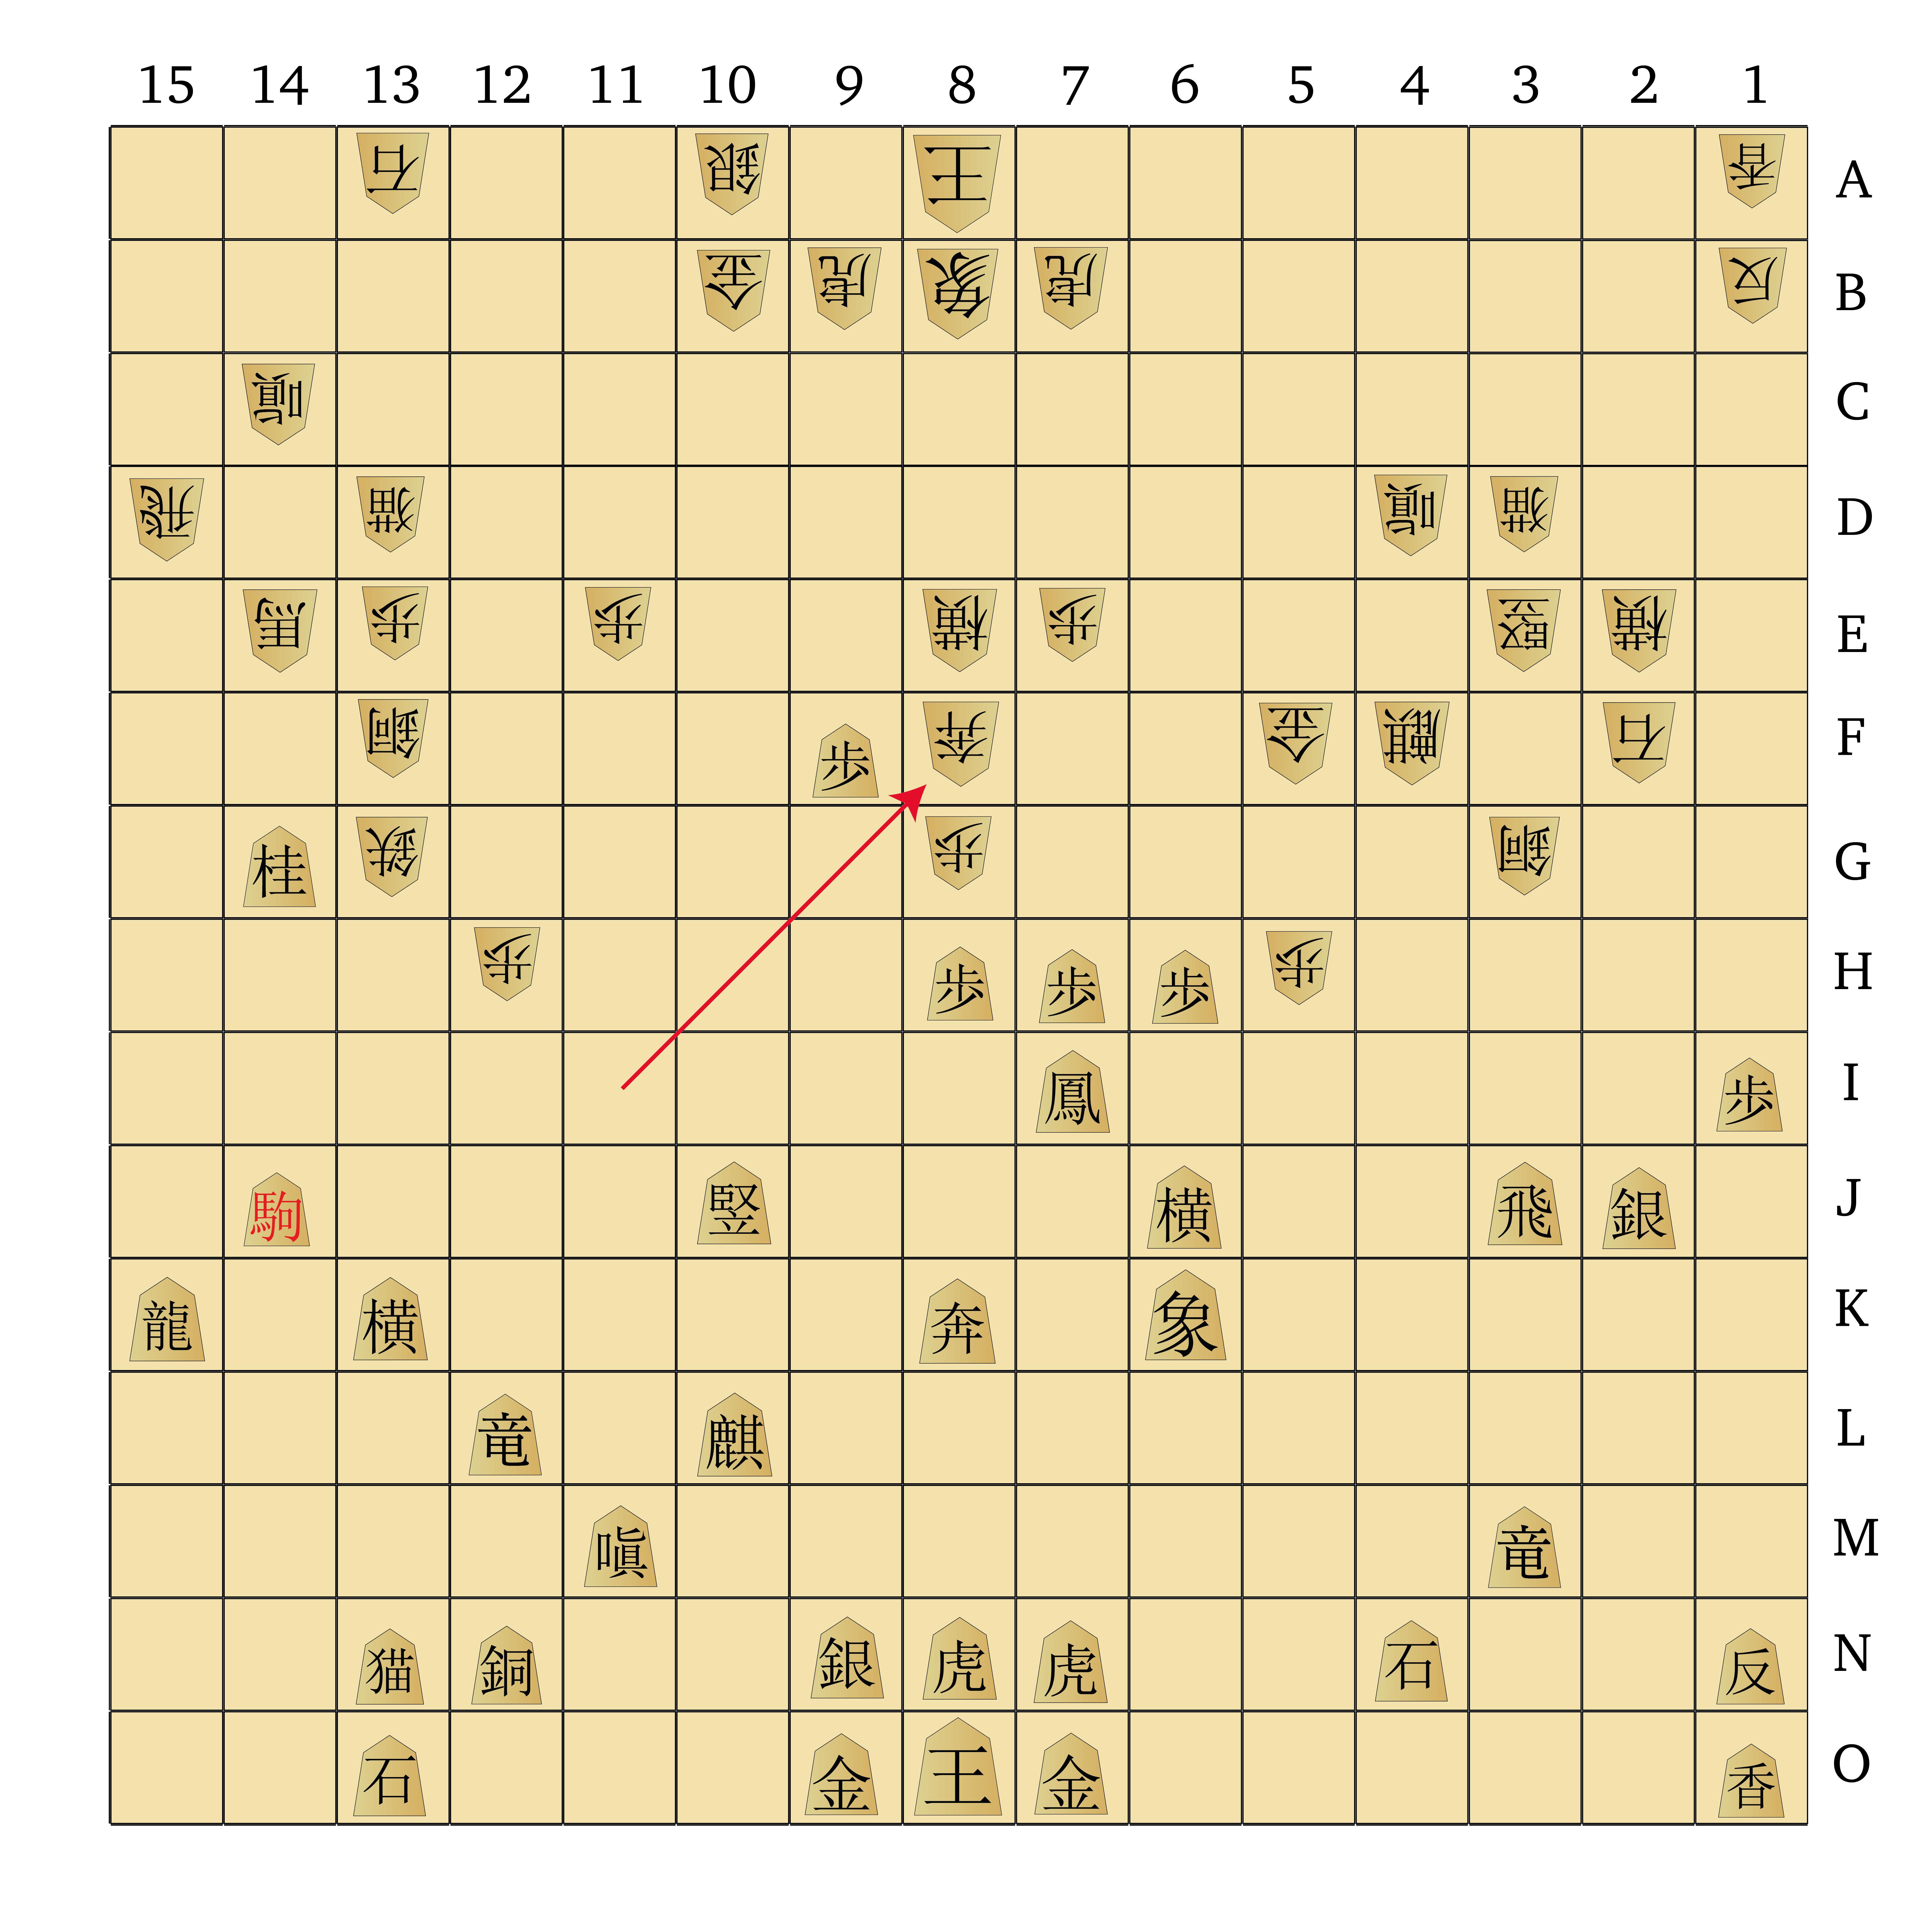 Dai Shogi 420 -- Move 410-01